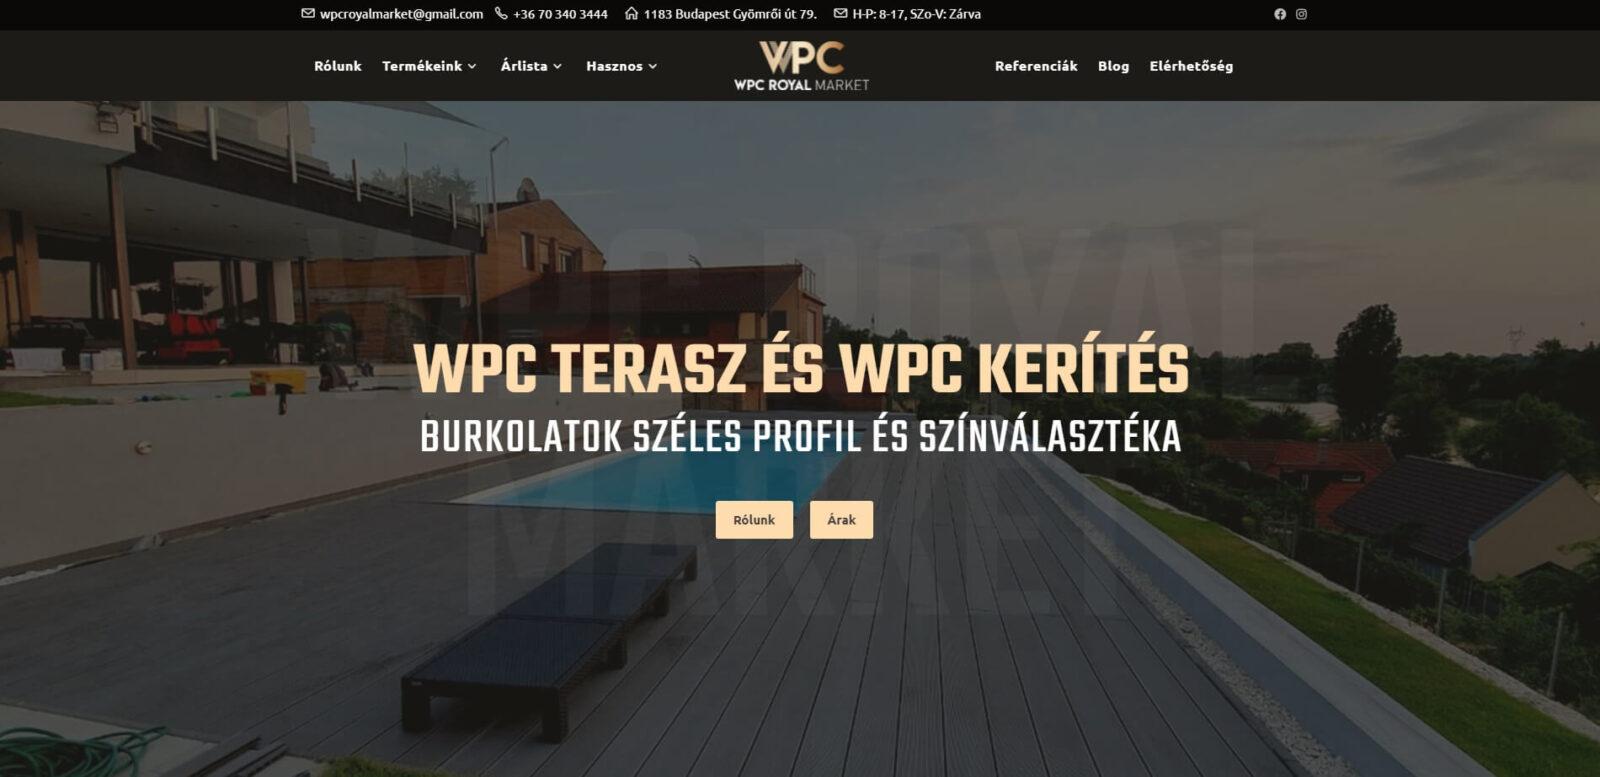 wpcroyalmarket